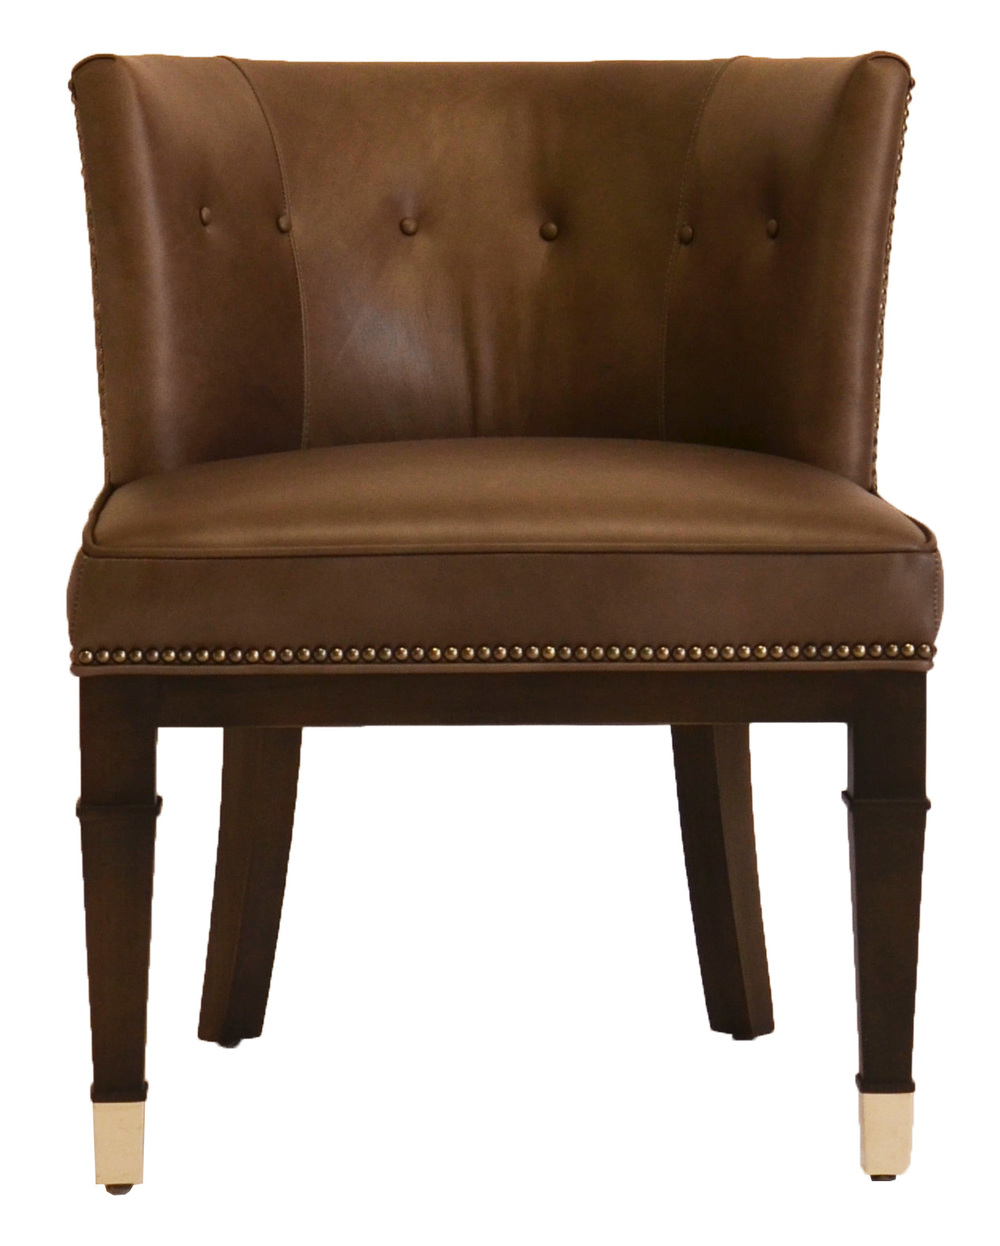 Vanguard Furniture - Josephine Chair